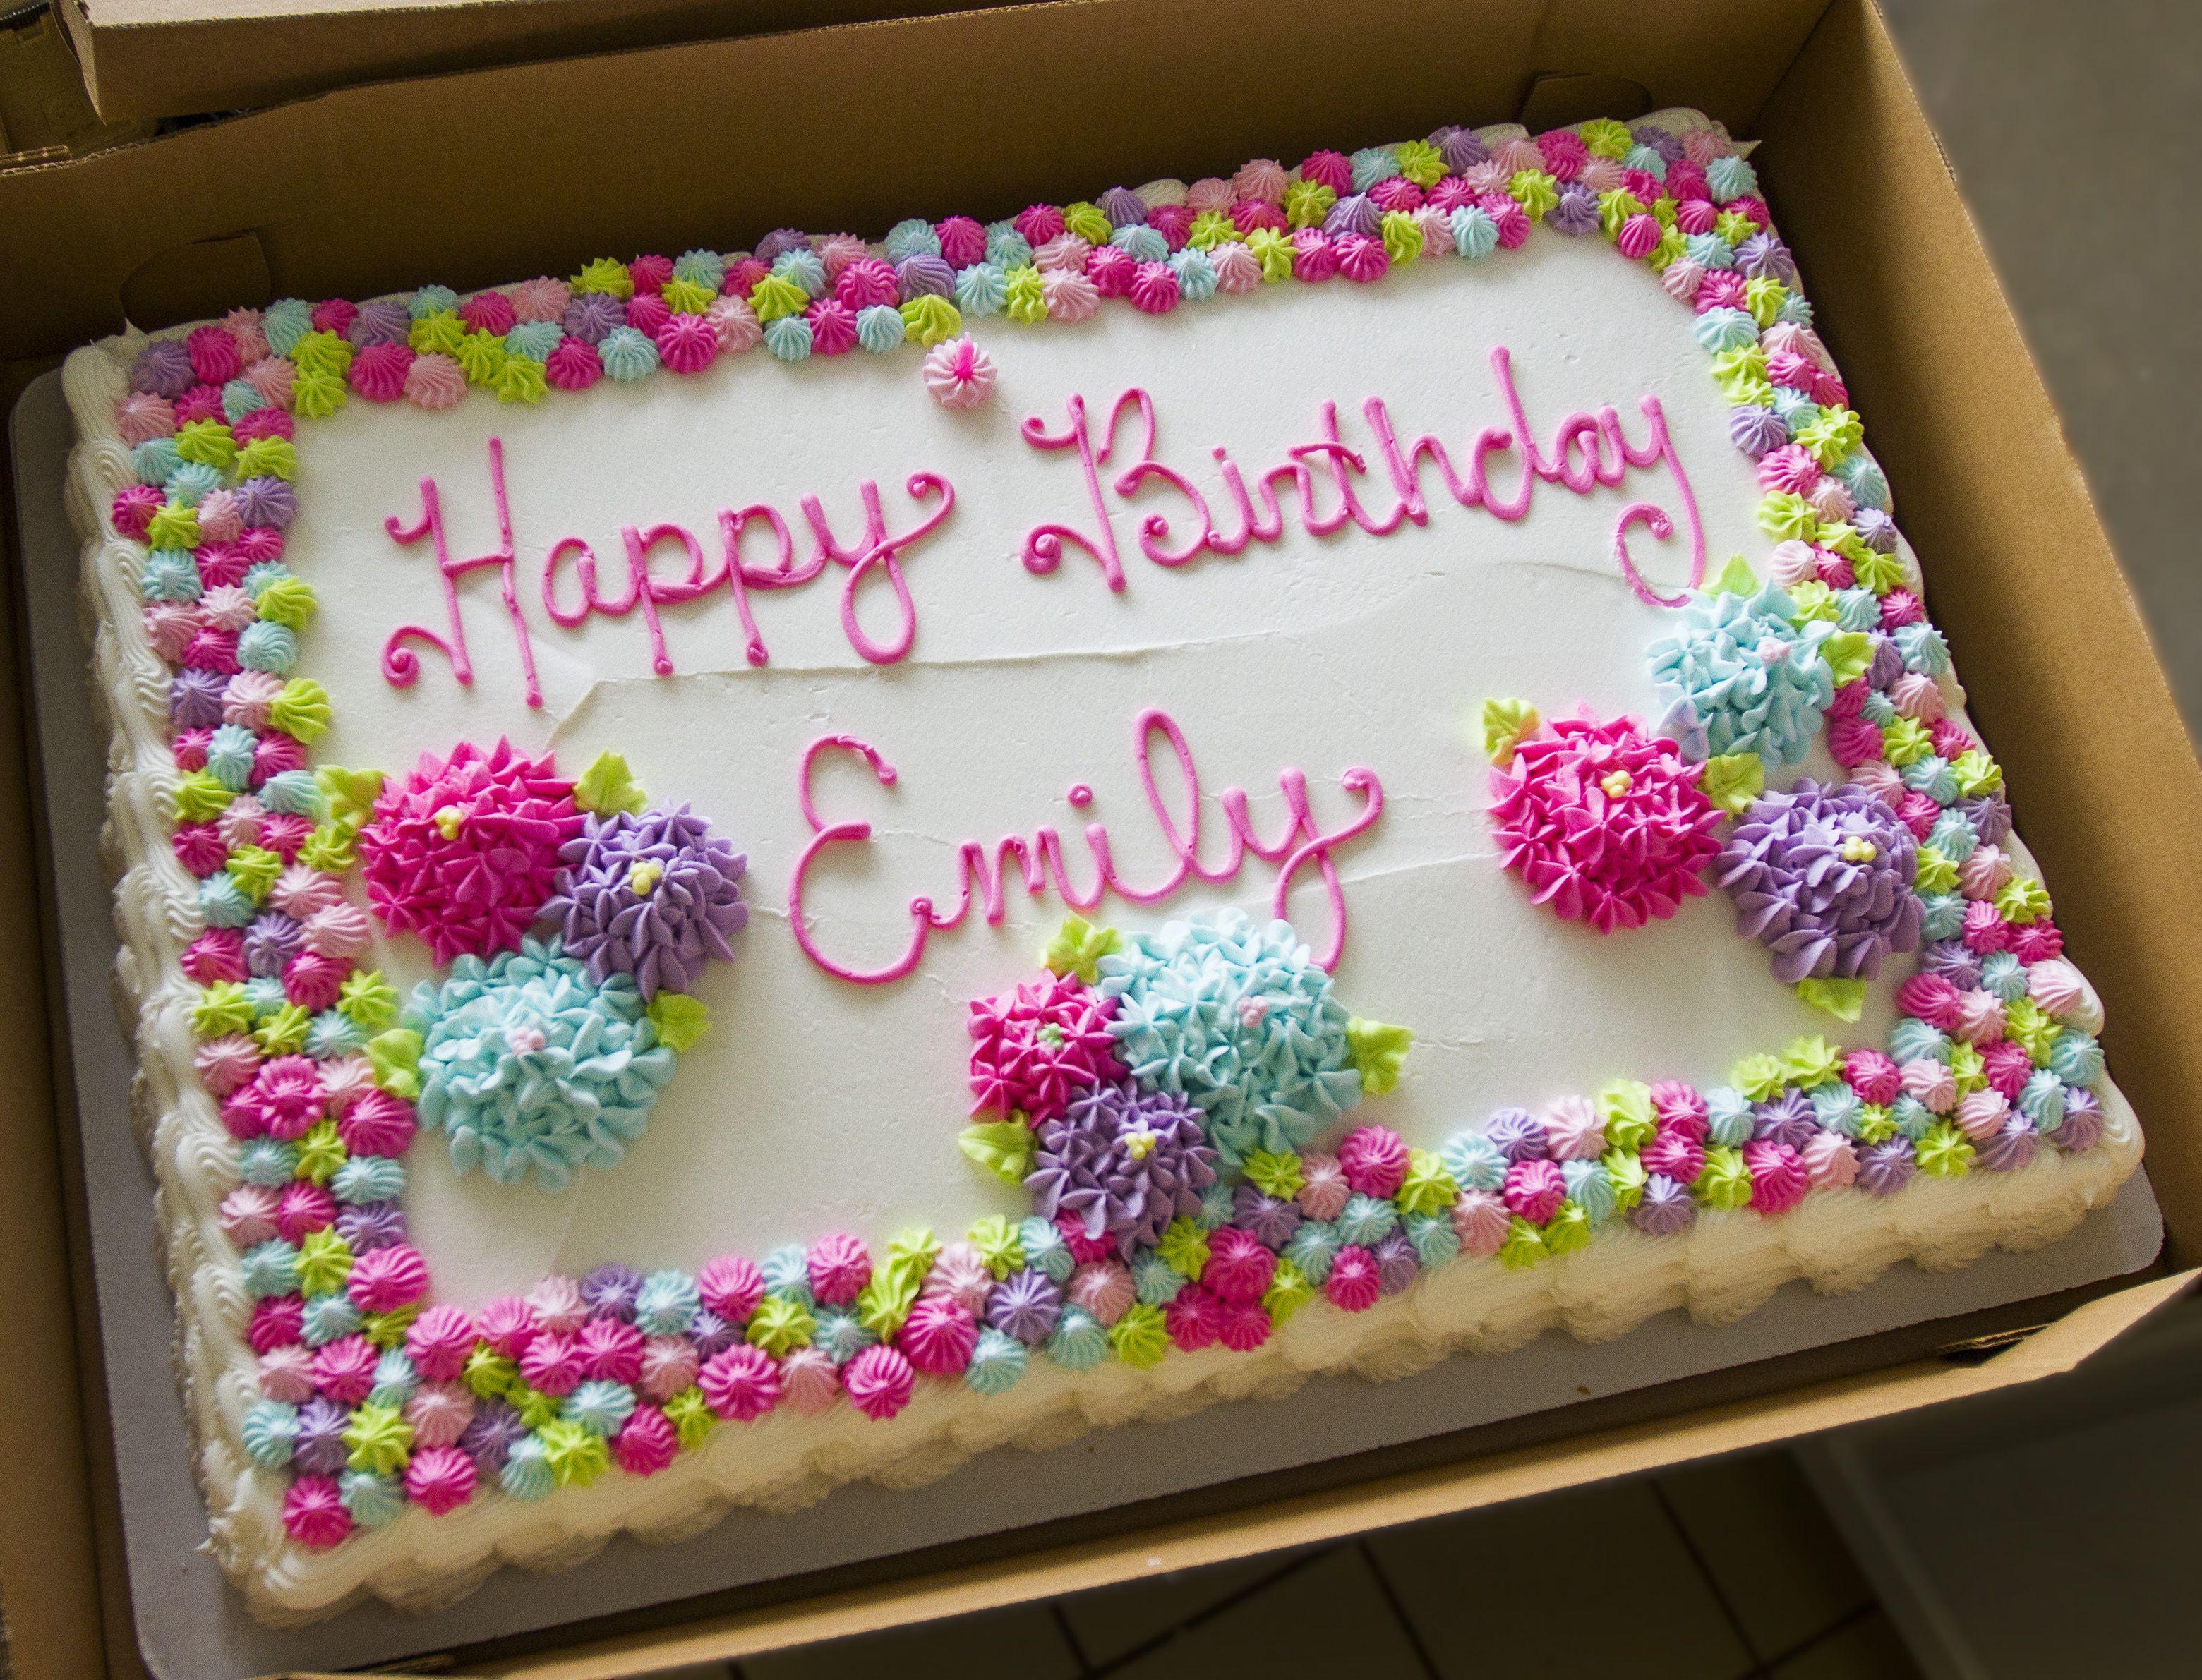 classic floral sheet cake for birthday celebration also rh pinterest